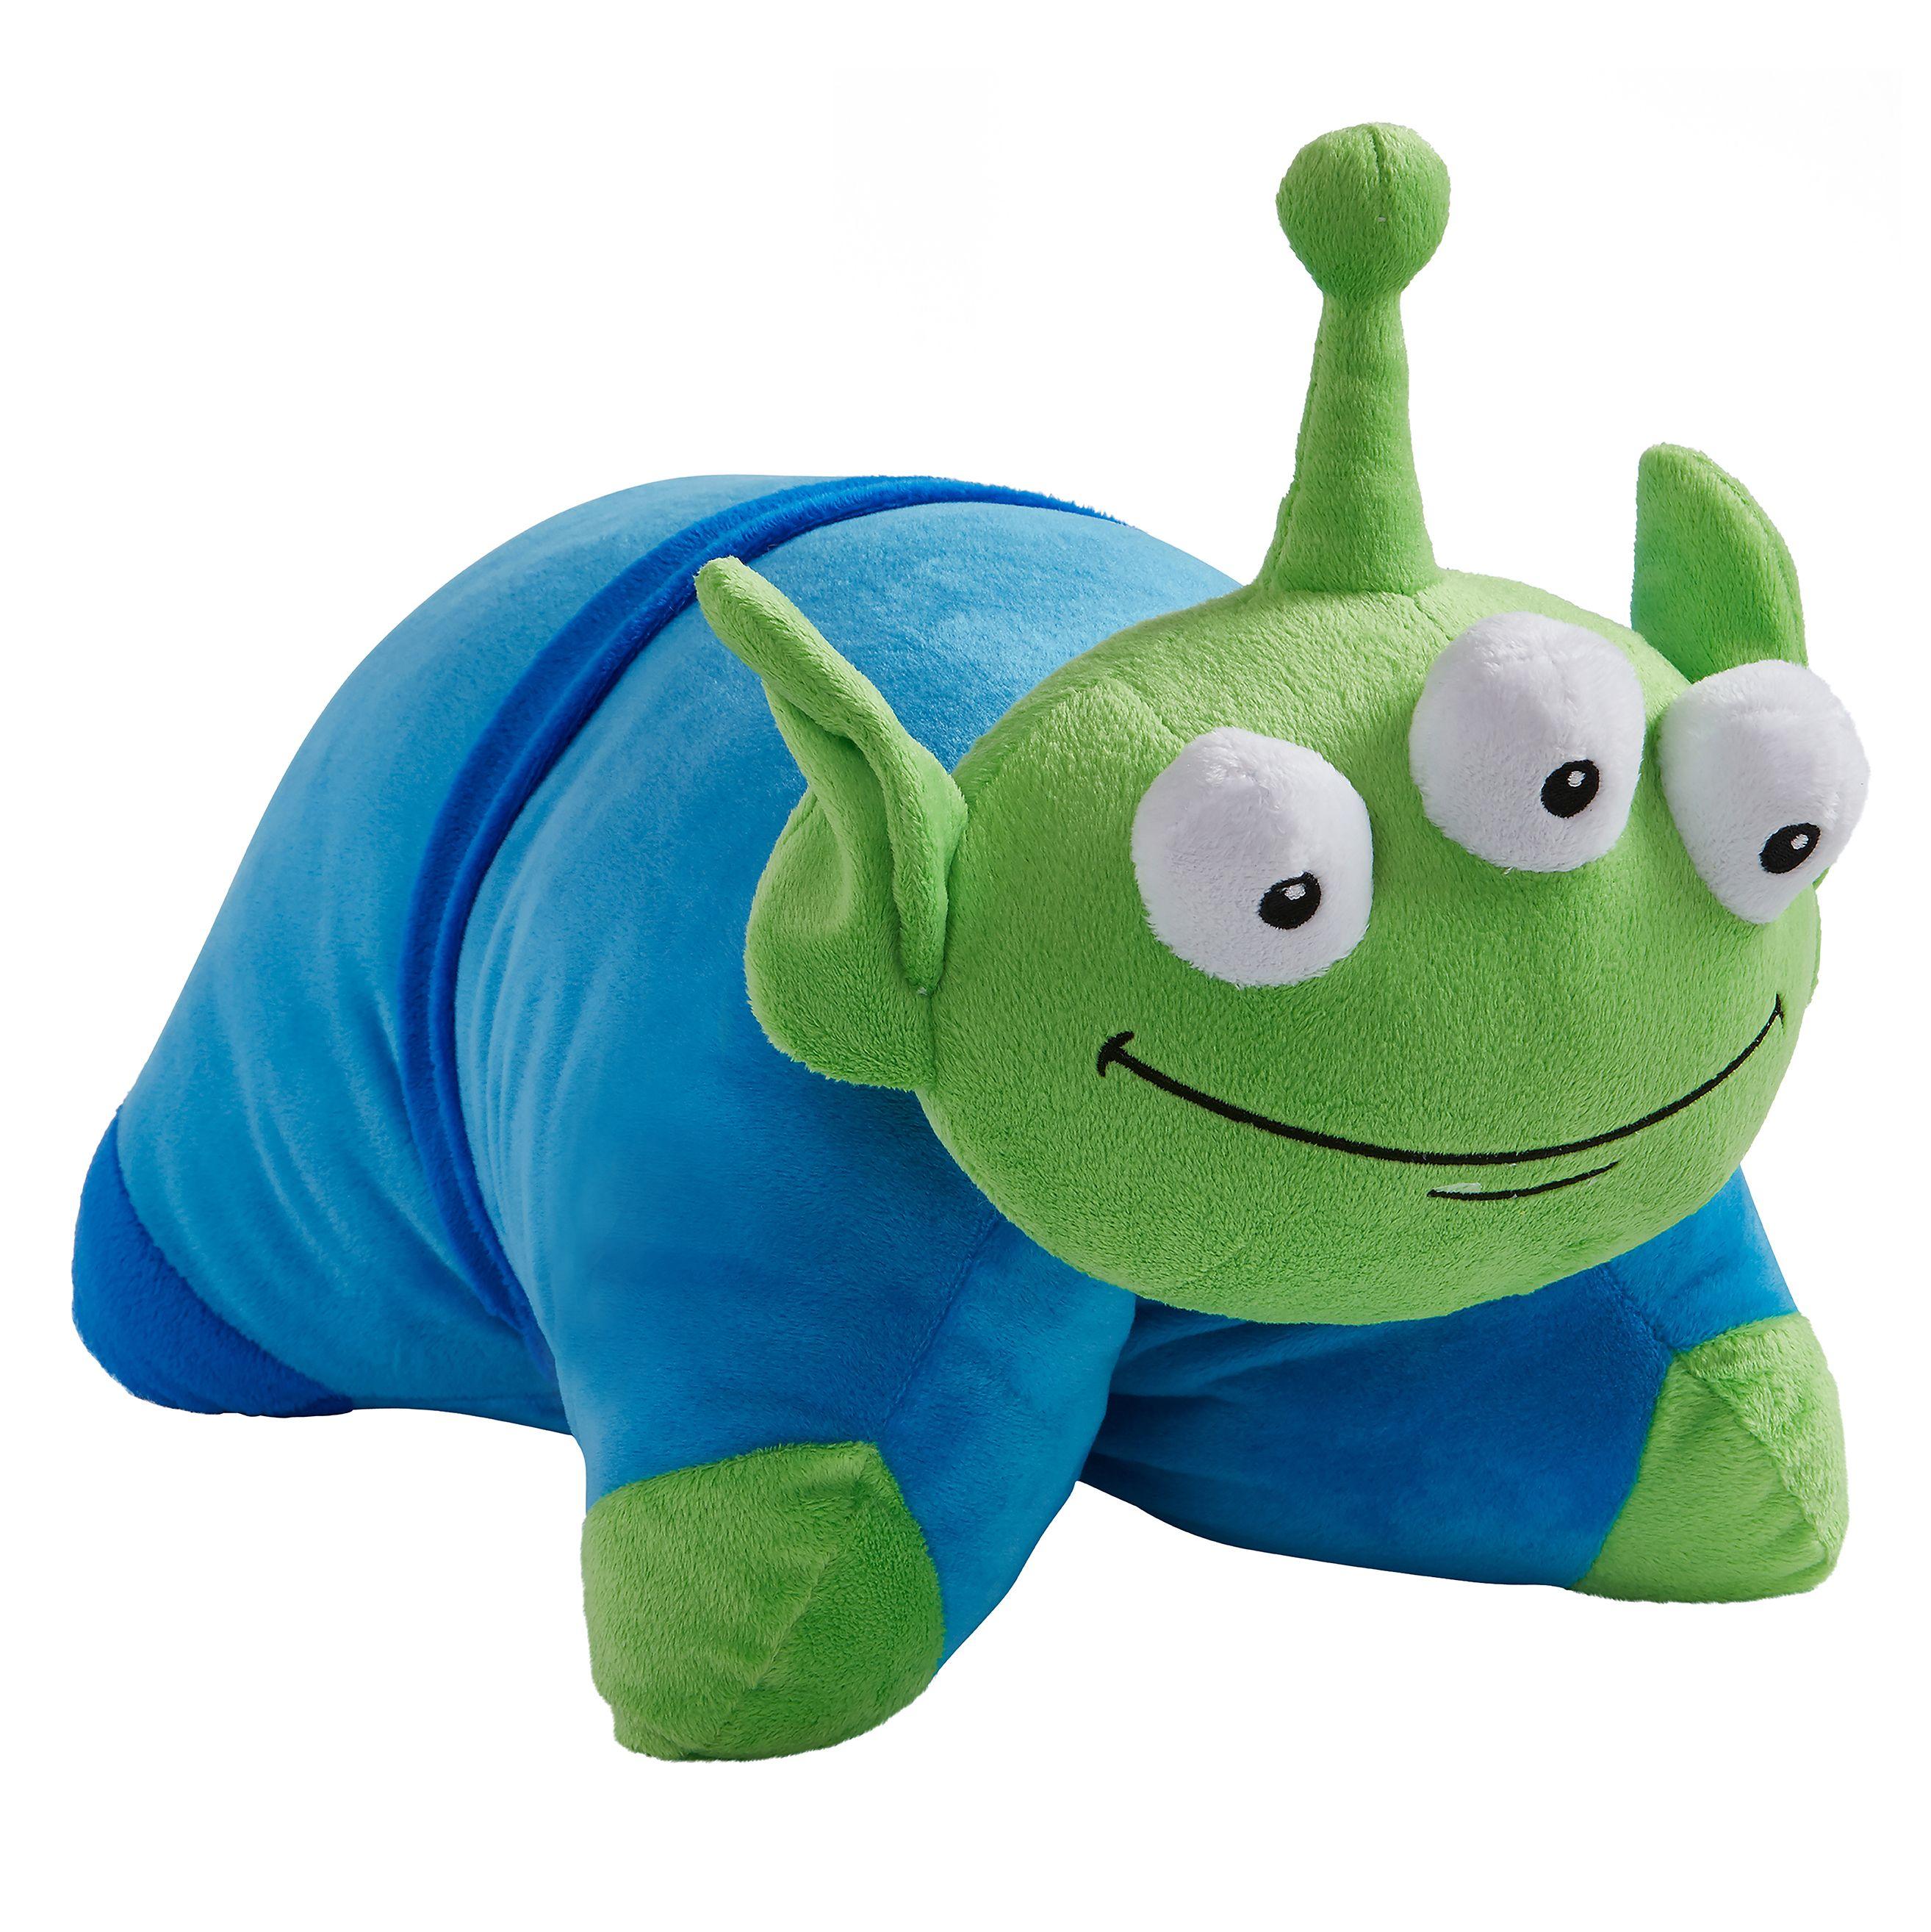 Toy Story Little Green Man Disney Stuffed Animals Animal Pillows Alien Plush